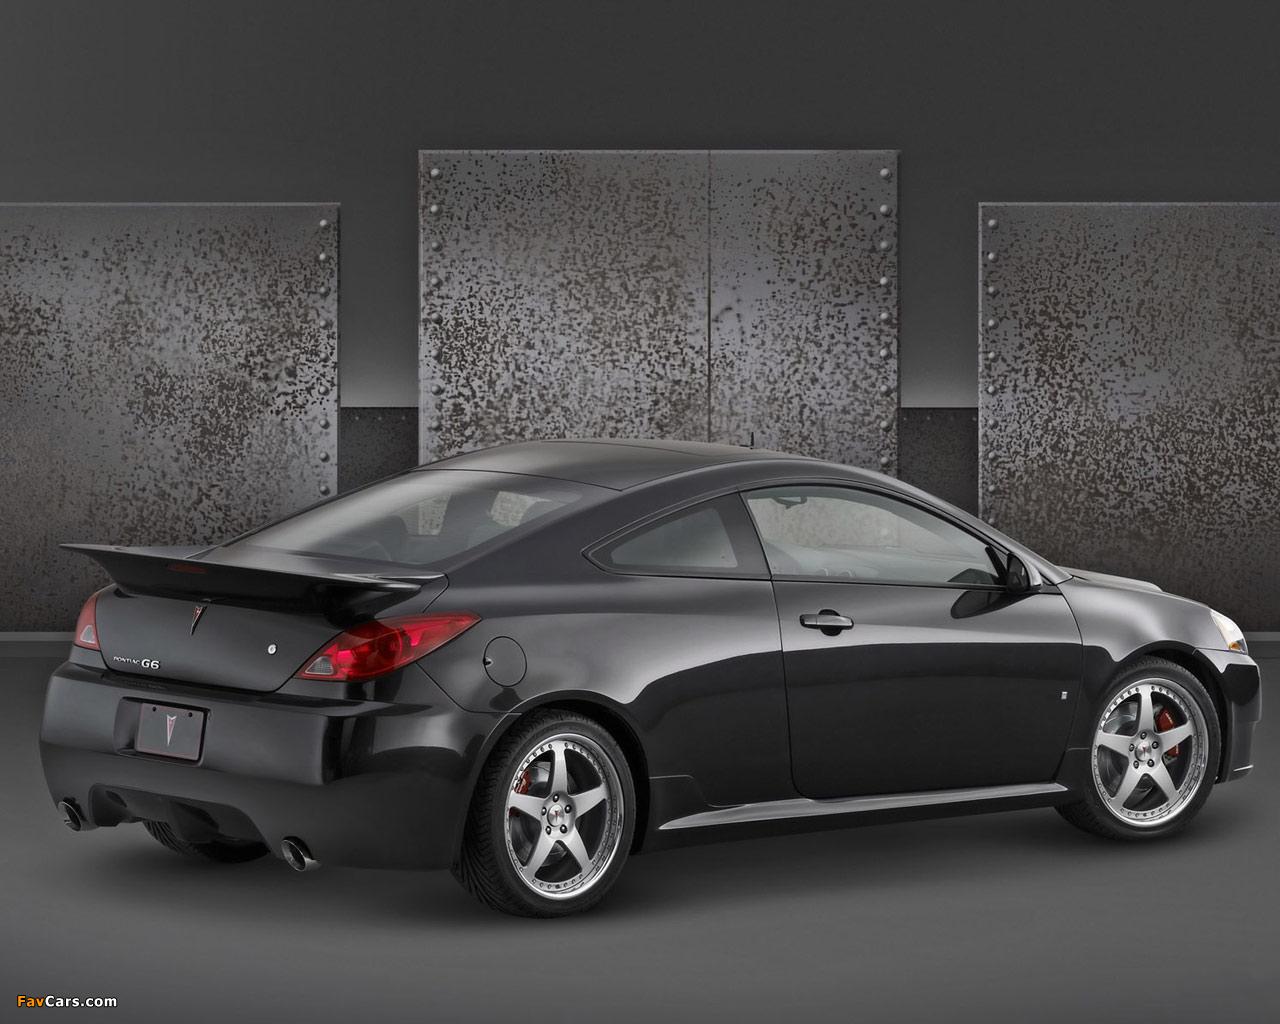 hight resolution of pontiac g6 gxp street edition coupe 2007 09 photos 1280 x 1024